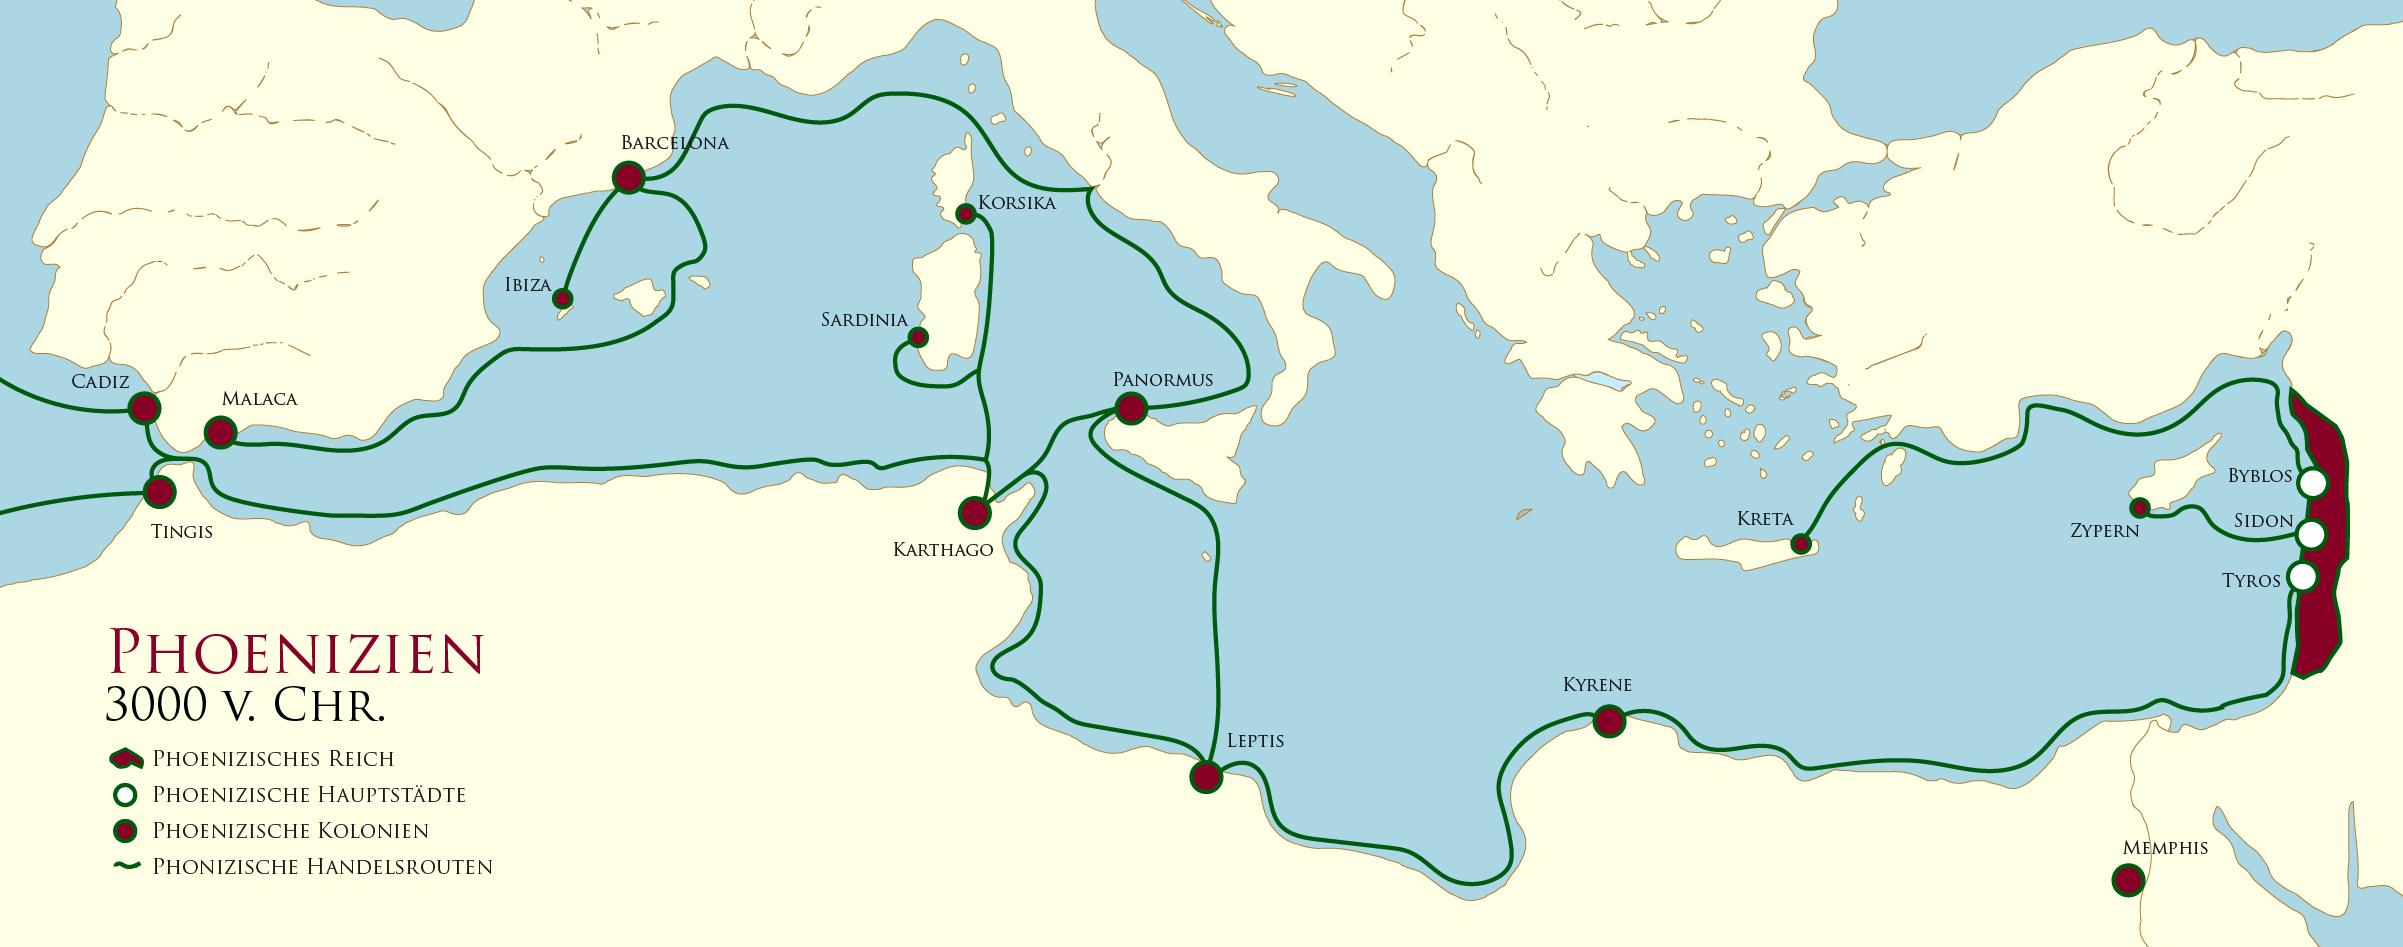 Handelsruten der Phönizier